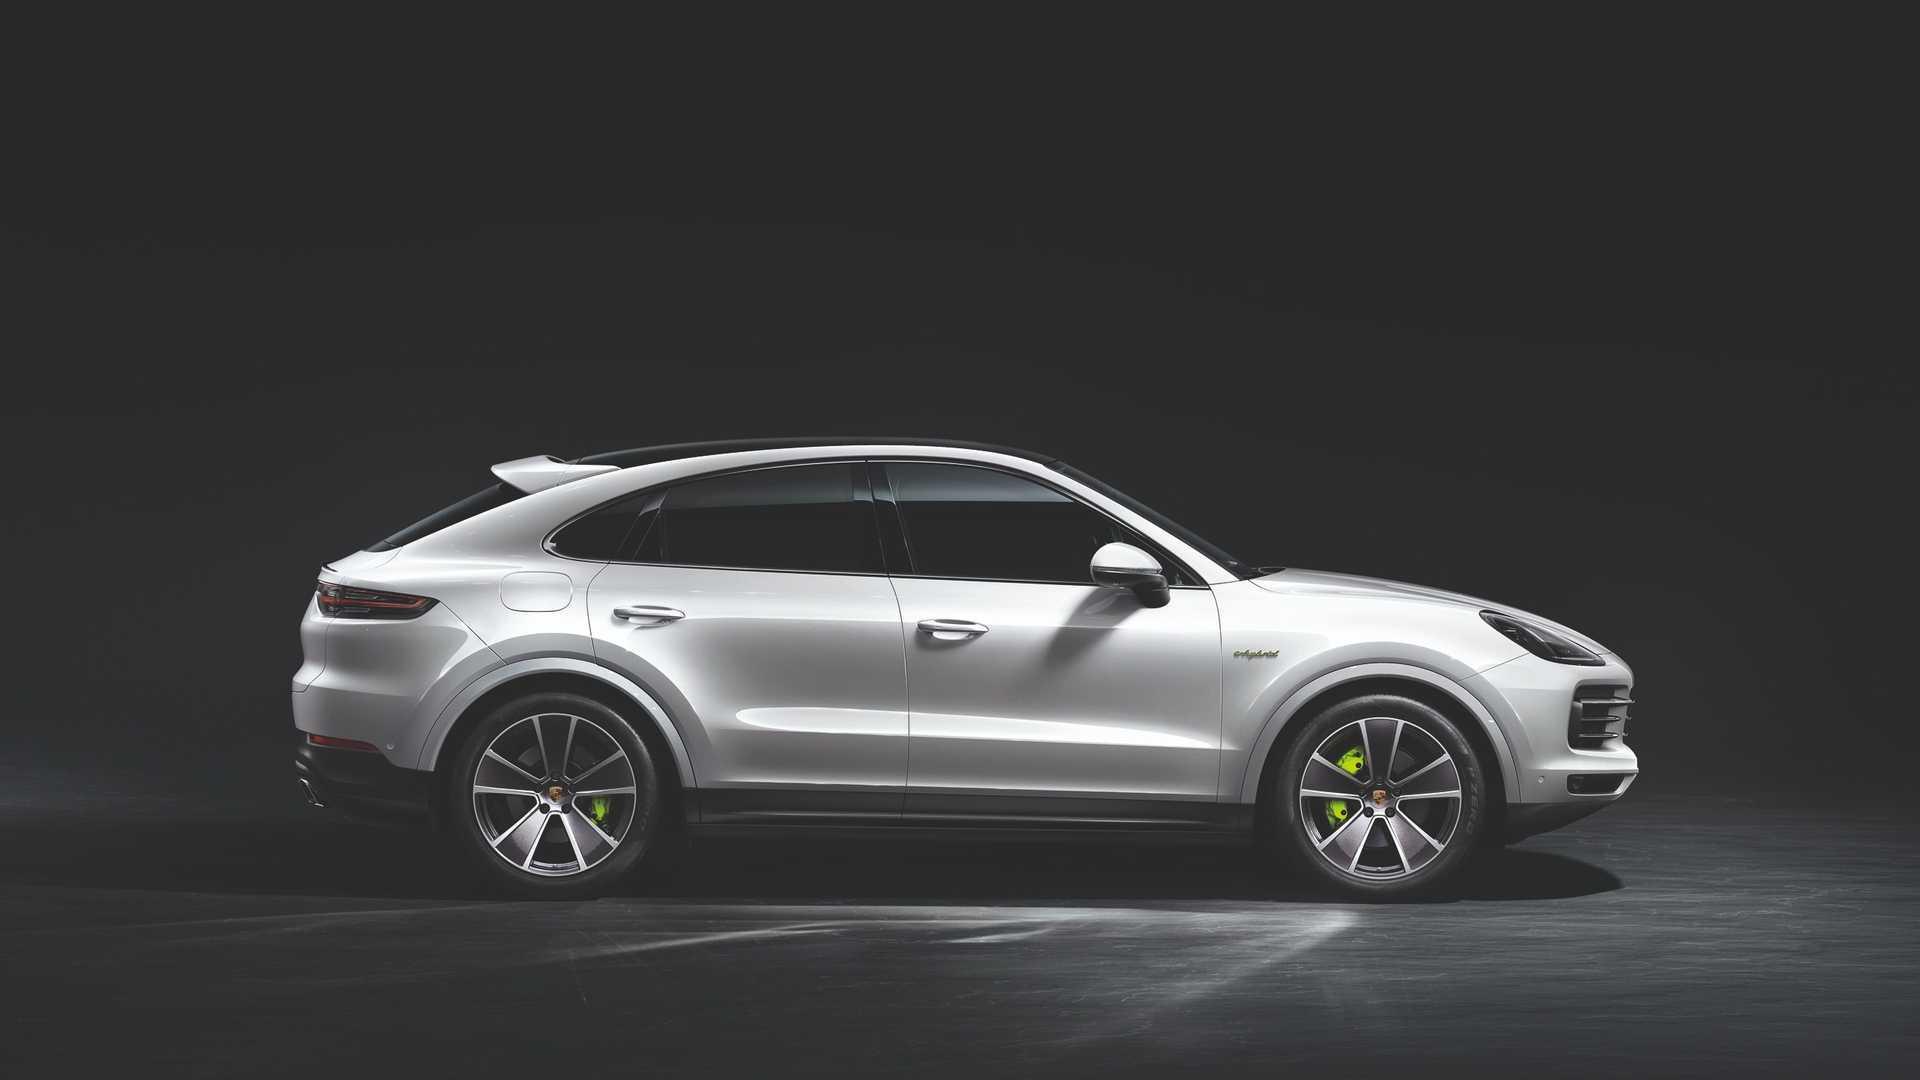 2020-porsche-cayenne-turbo-s-e-hybrid-coupe-turbo-s-e-hybrid-and-coupe-e-hybrid-8